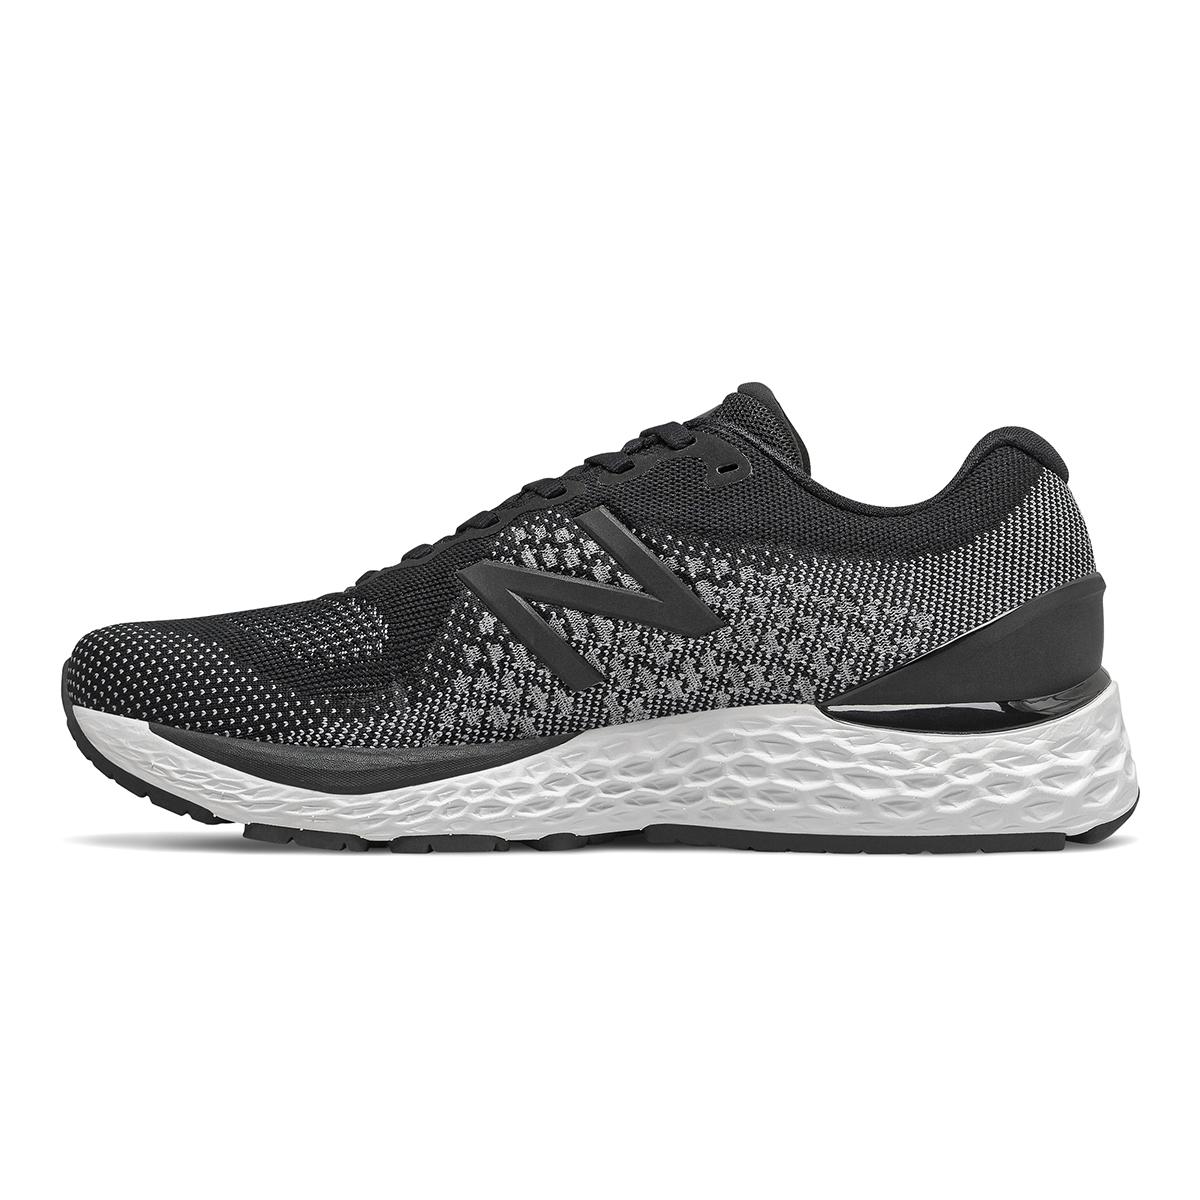 Men's New Balance 880v10 Running Shoe - Color: Black / White   (Regular Width) - Size: 10.5, Black / White, large, image 2